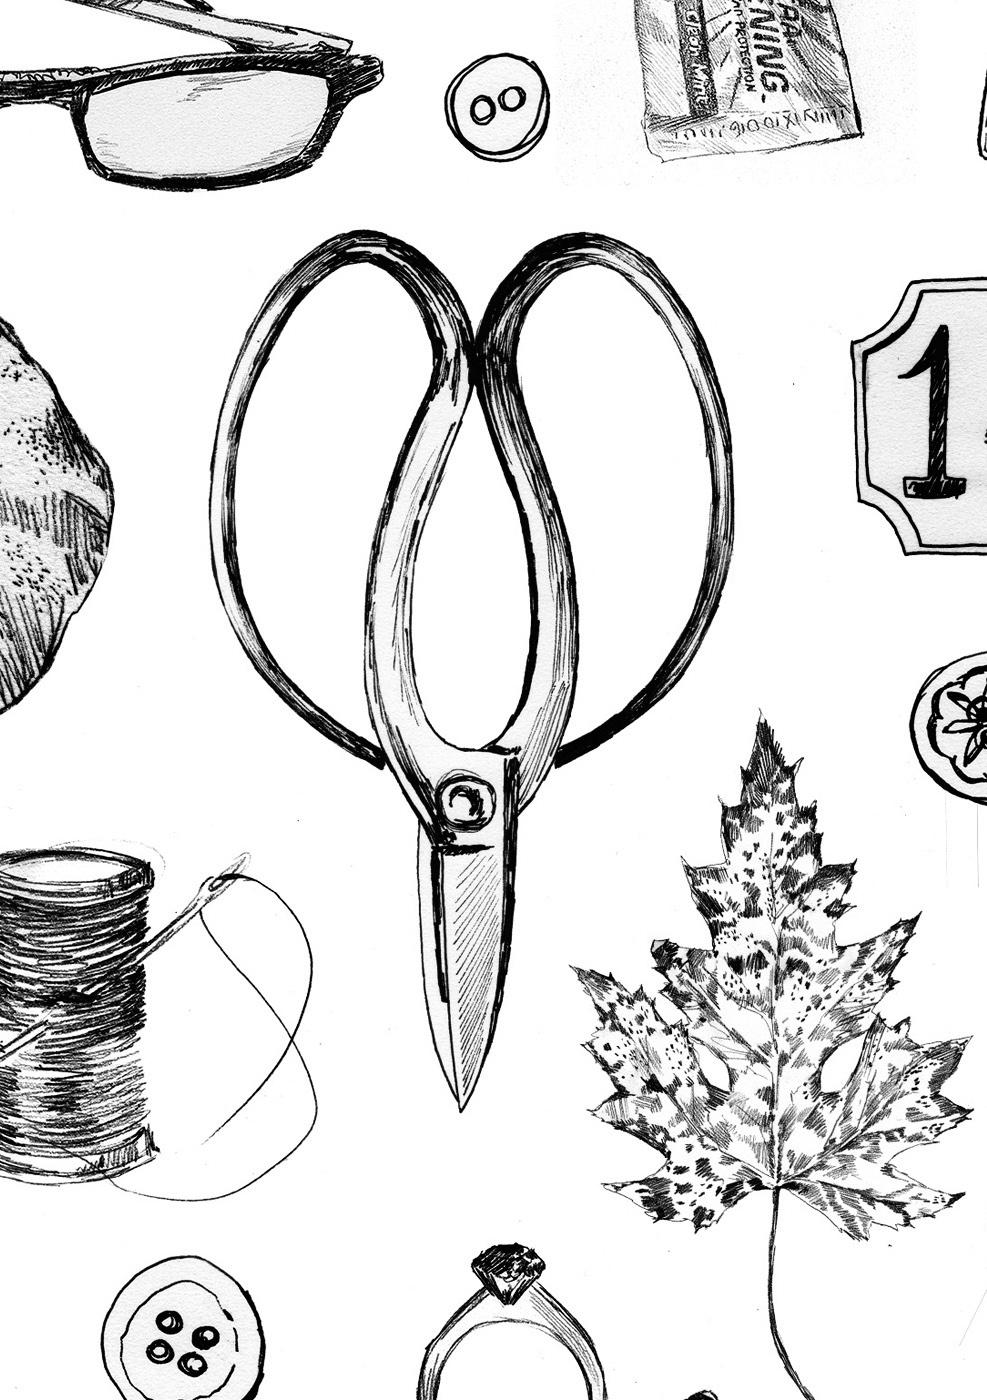 fig. 3. Detail